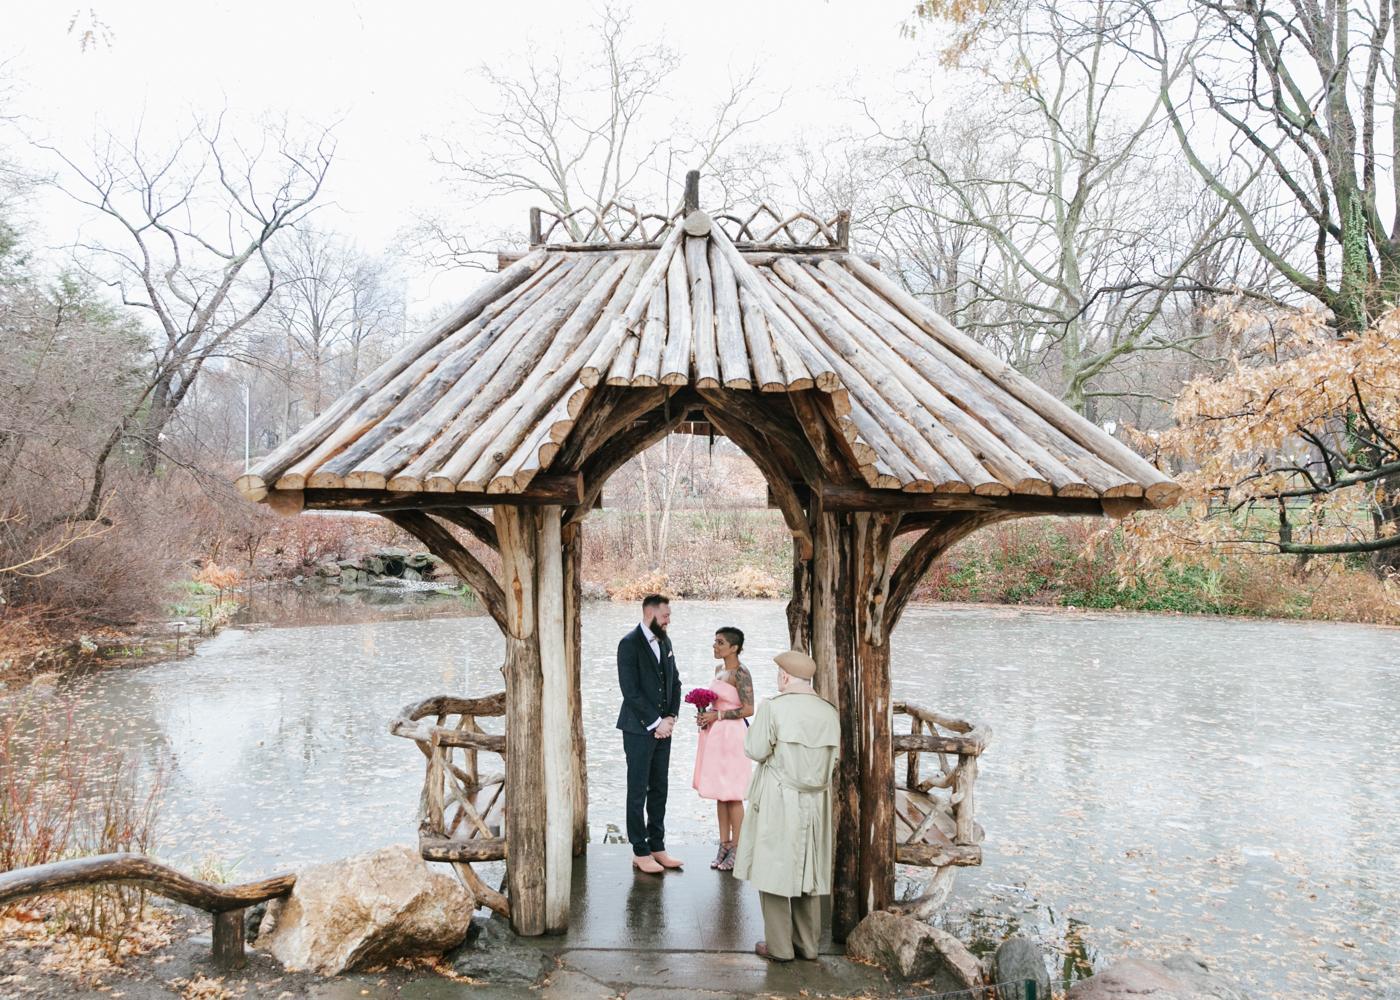 Central-park-wedding-by-Tanya-Isaeva-46.jpg